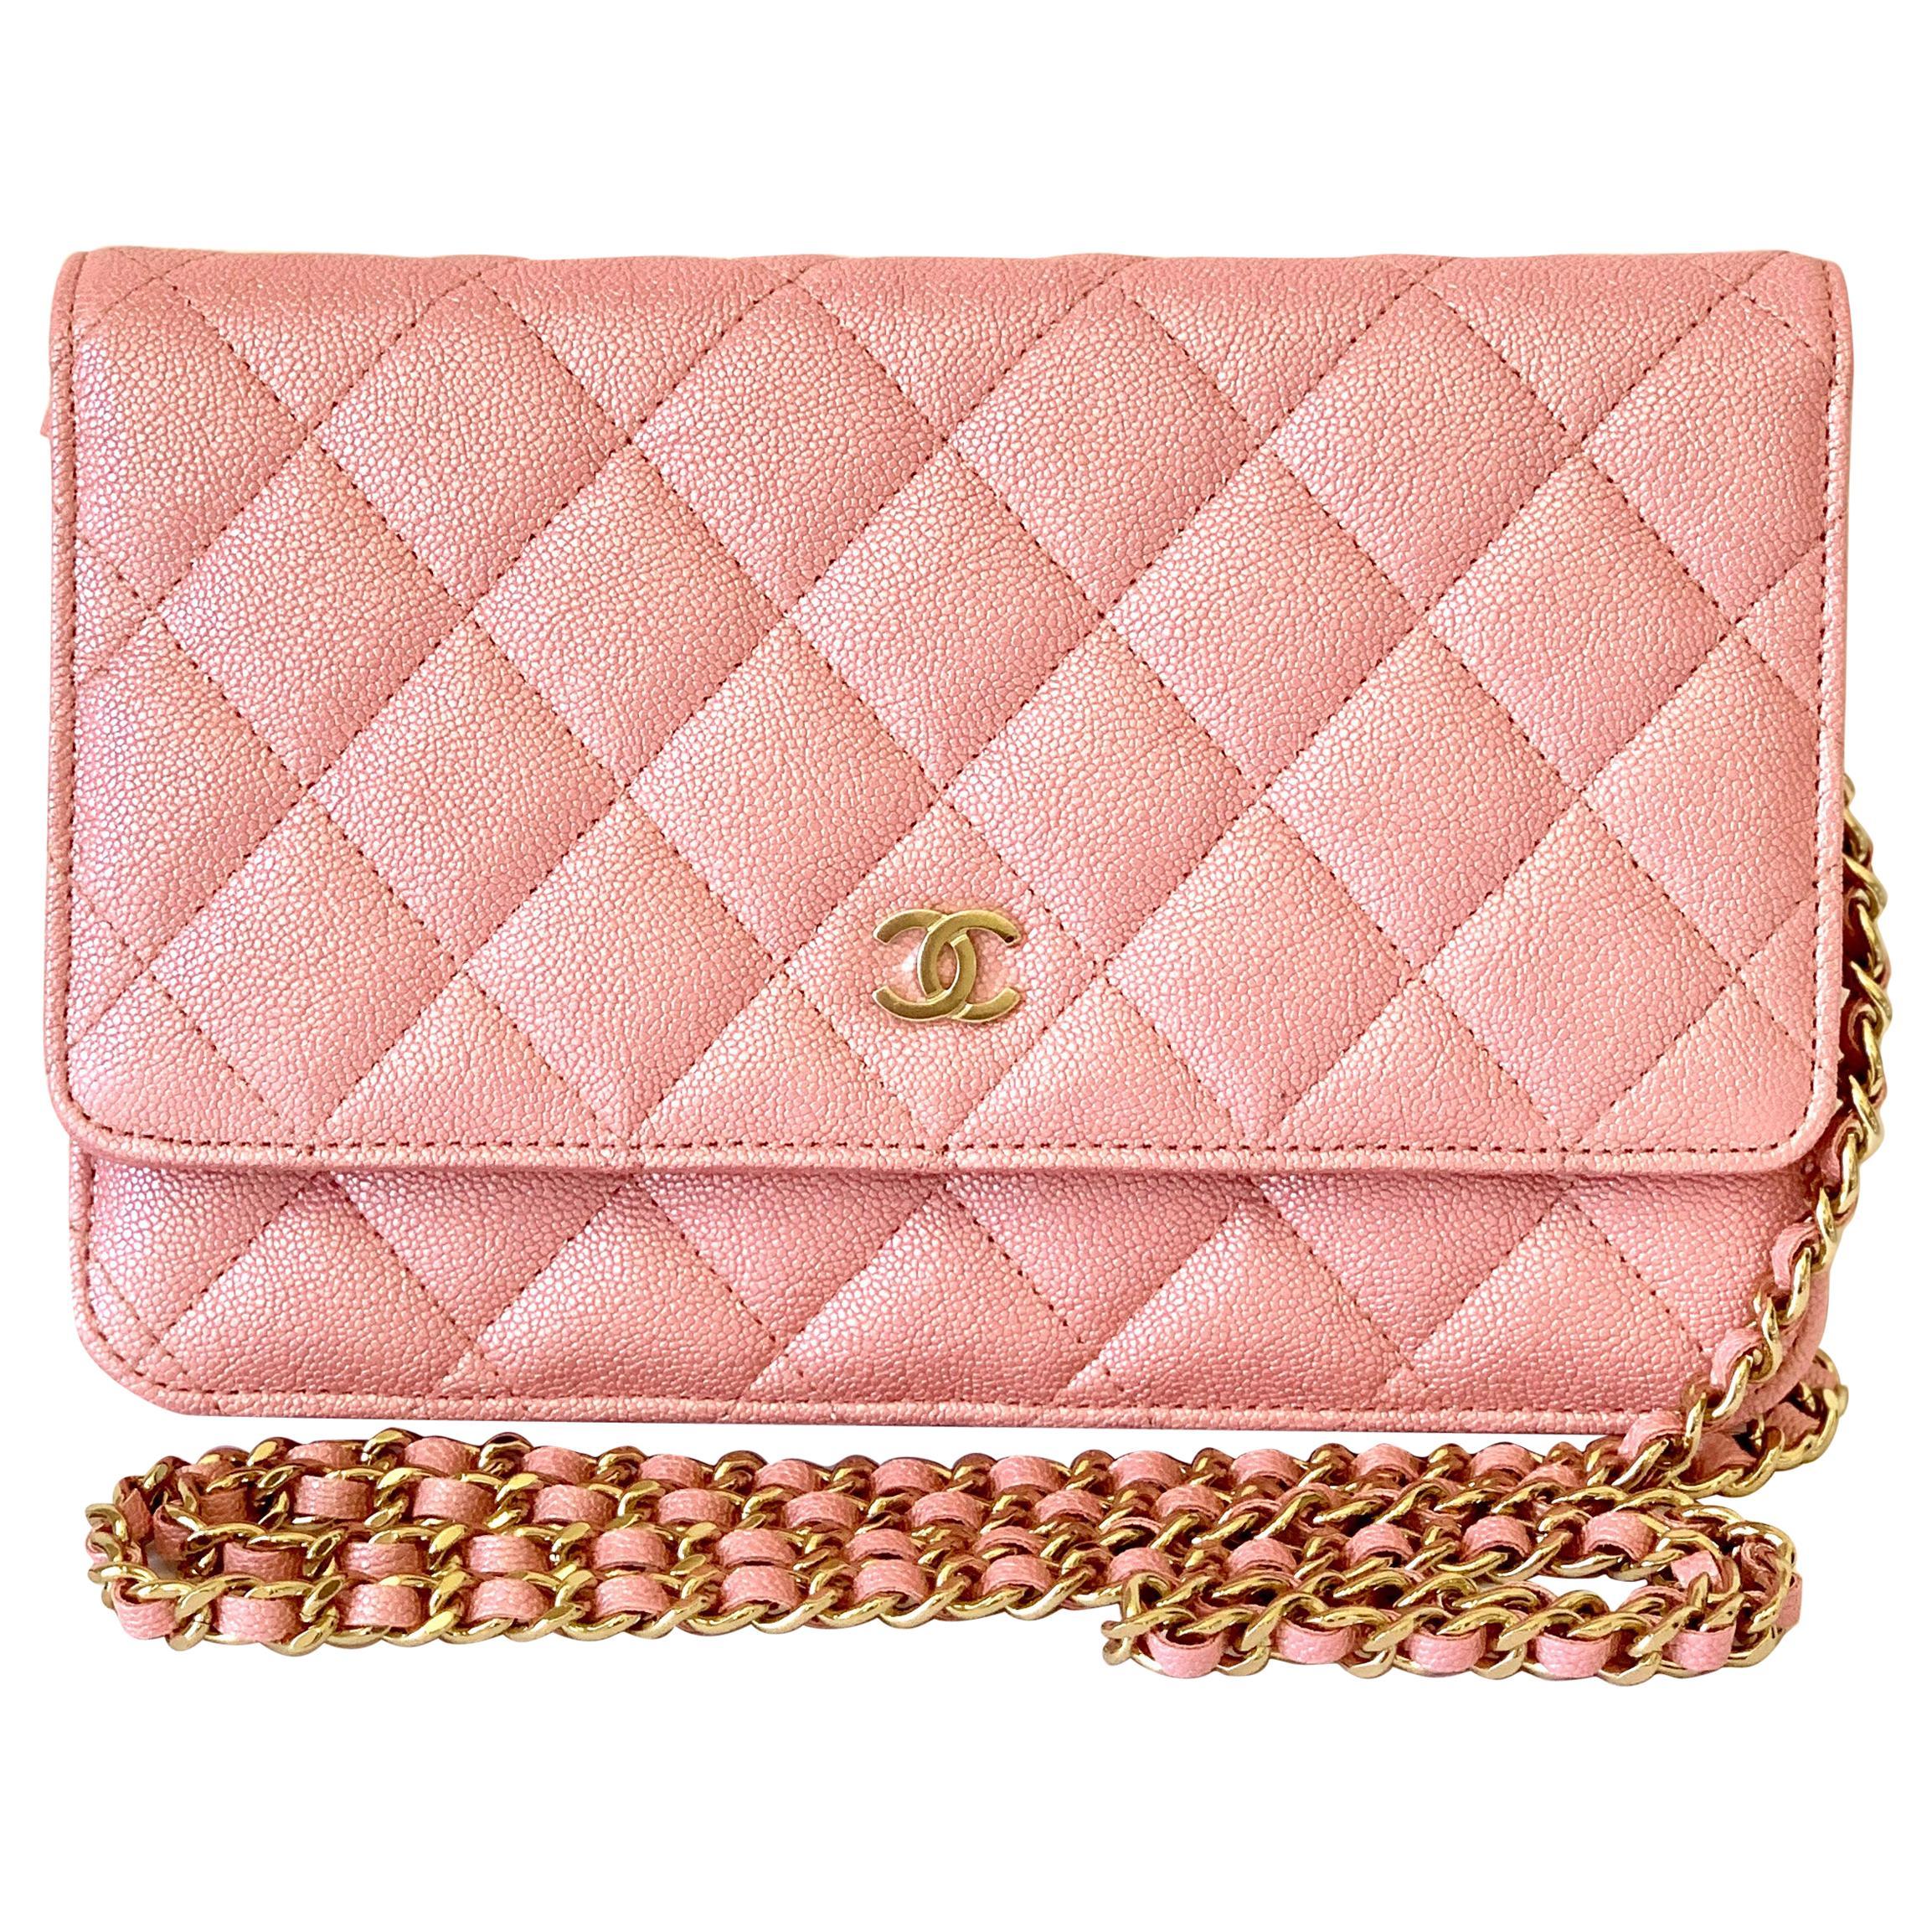 9b2ba4deef Vintage Chanel Purses and Handbags at 1stdibs - Page 2